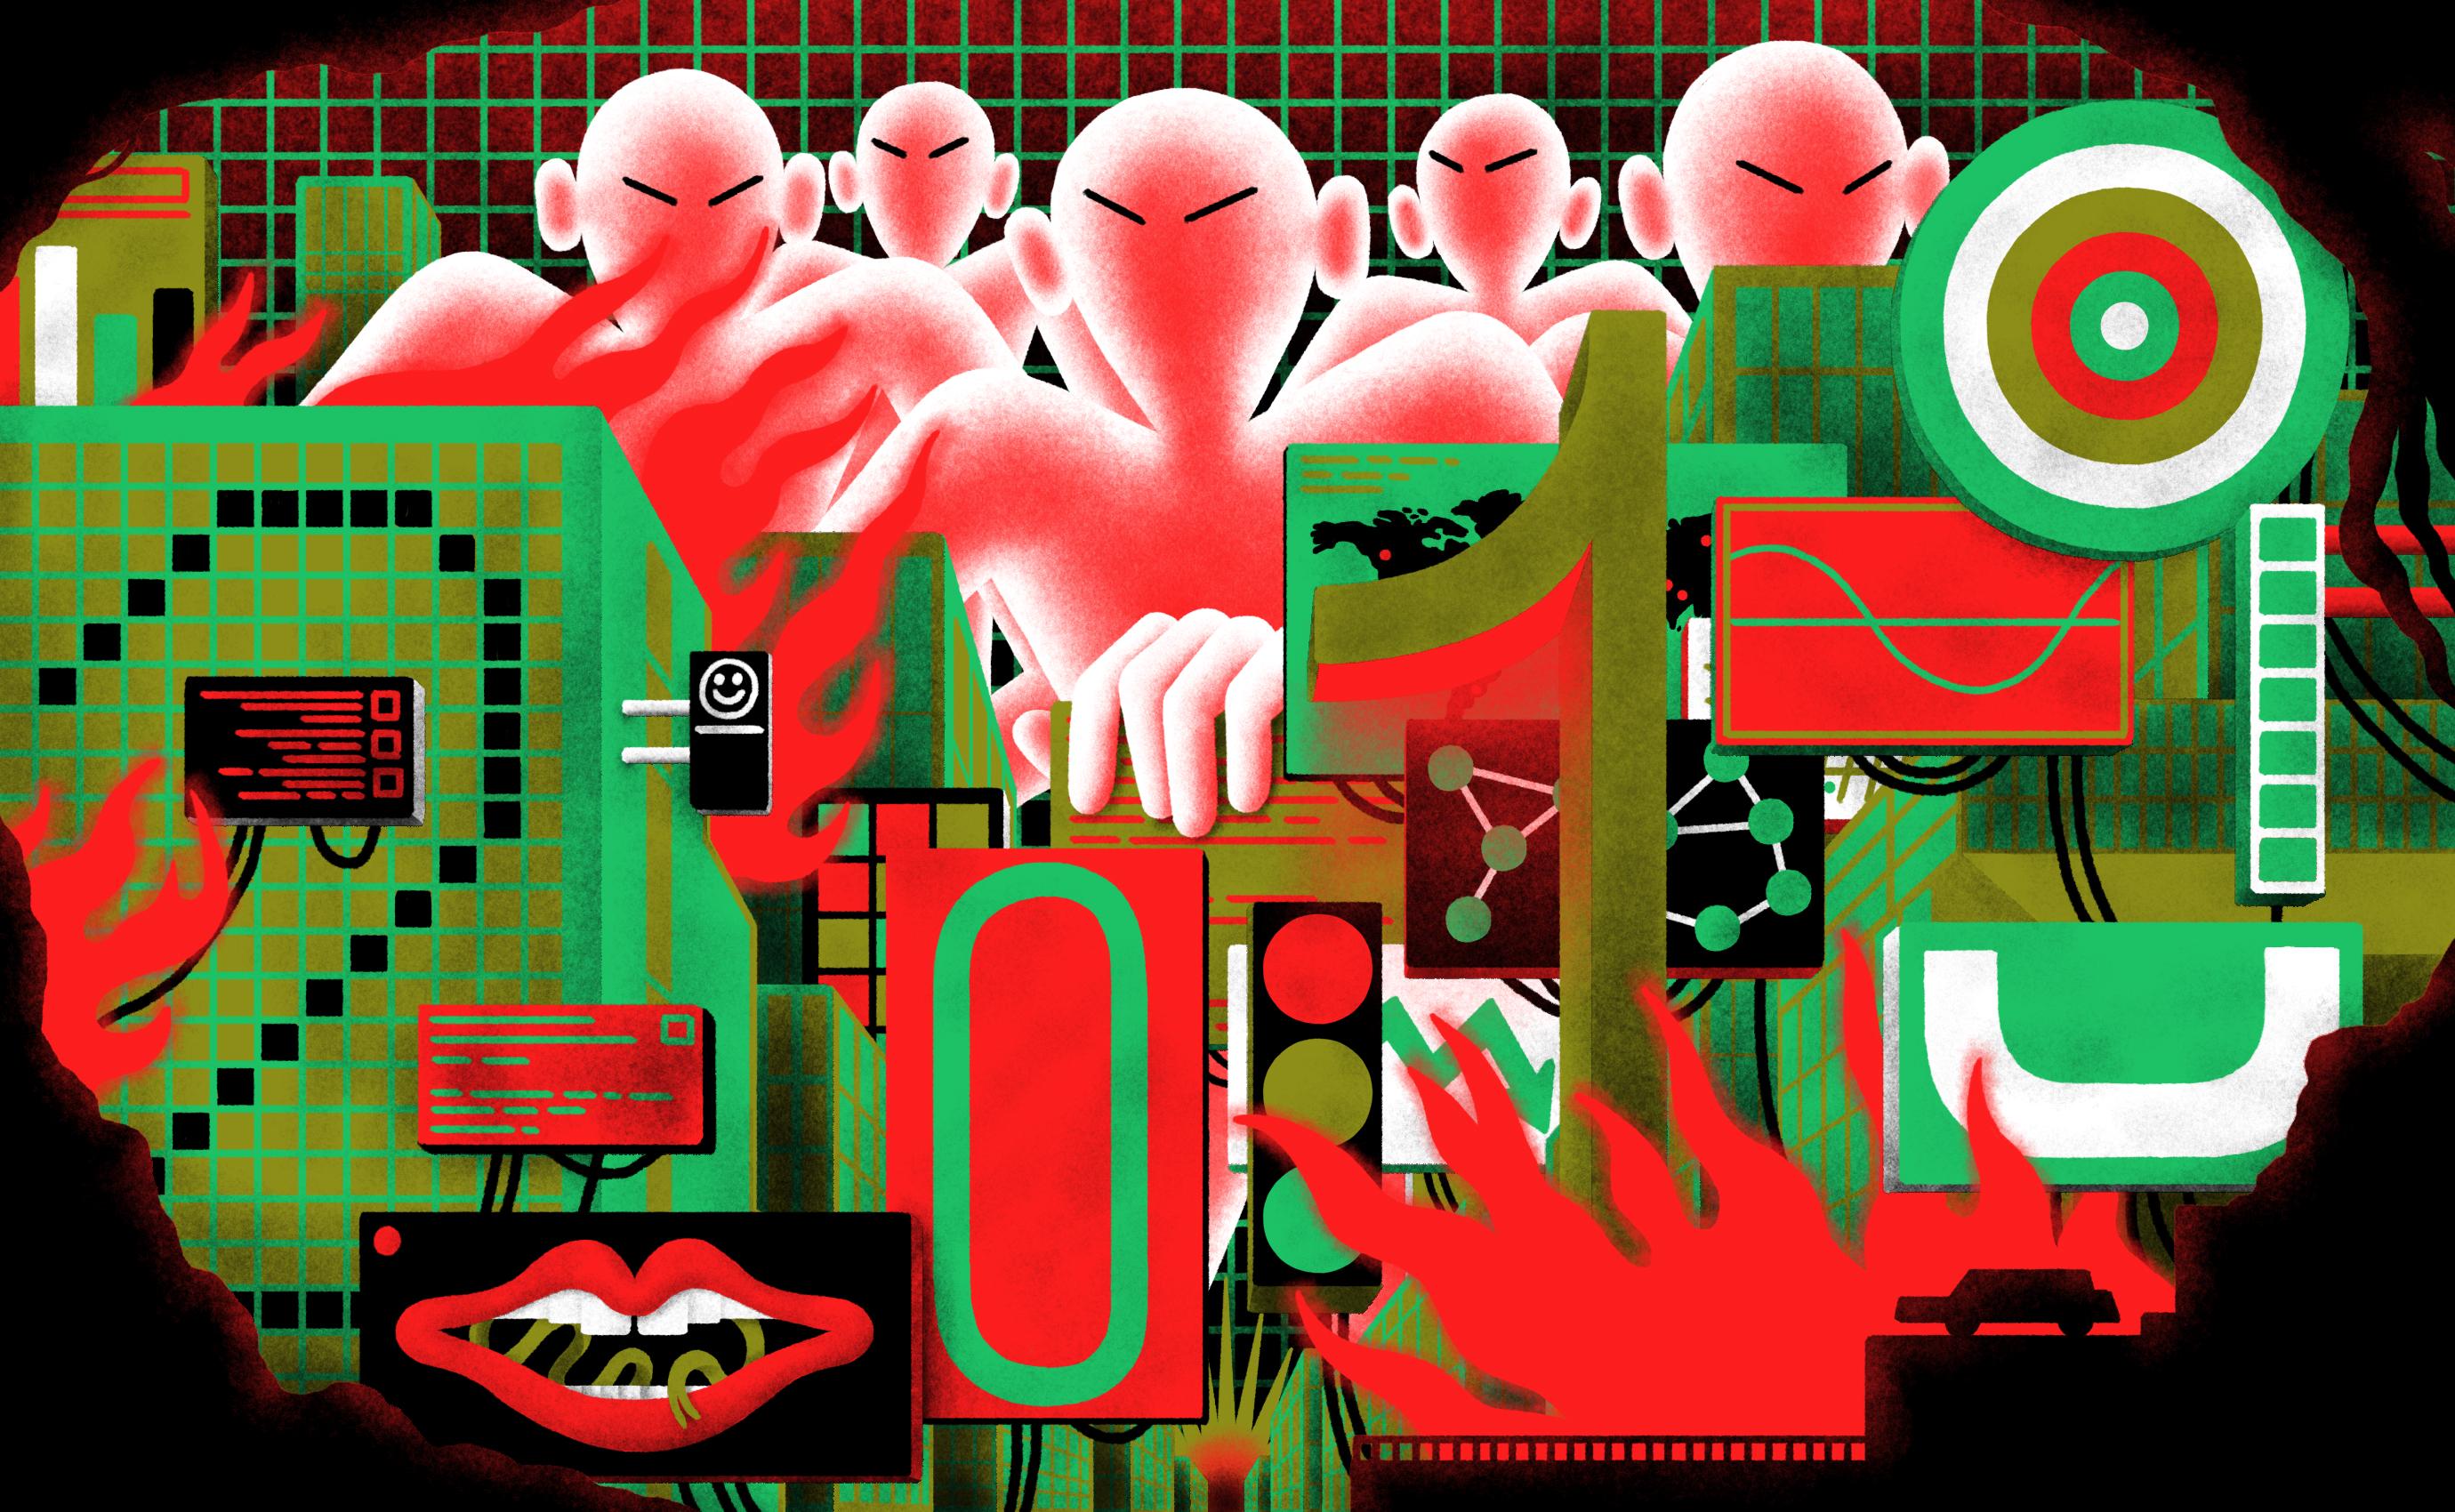 Cyberthreats-2019benedikt-luft